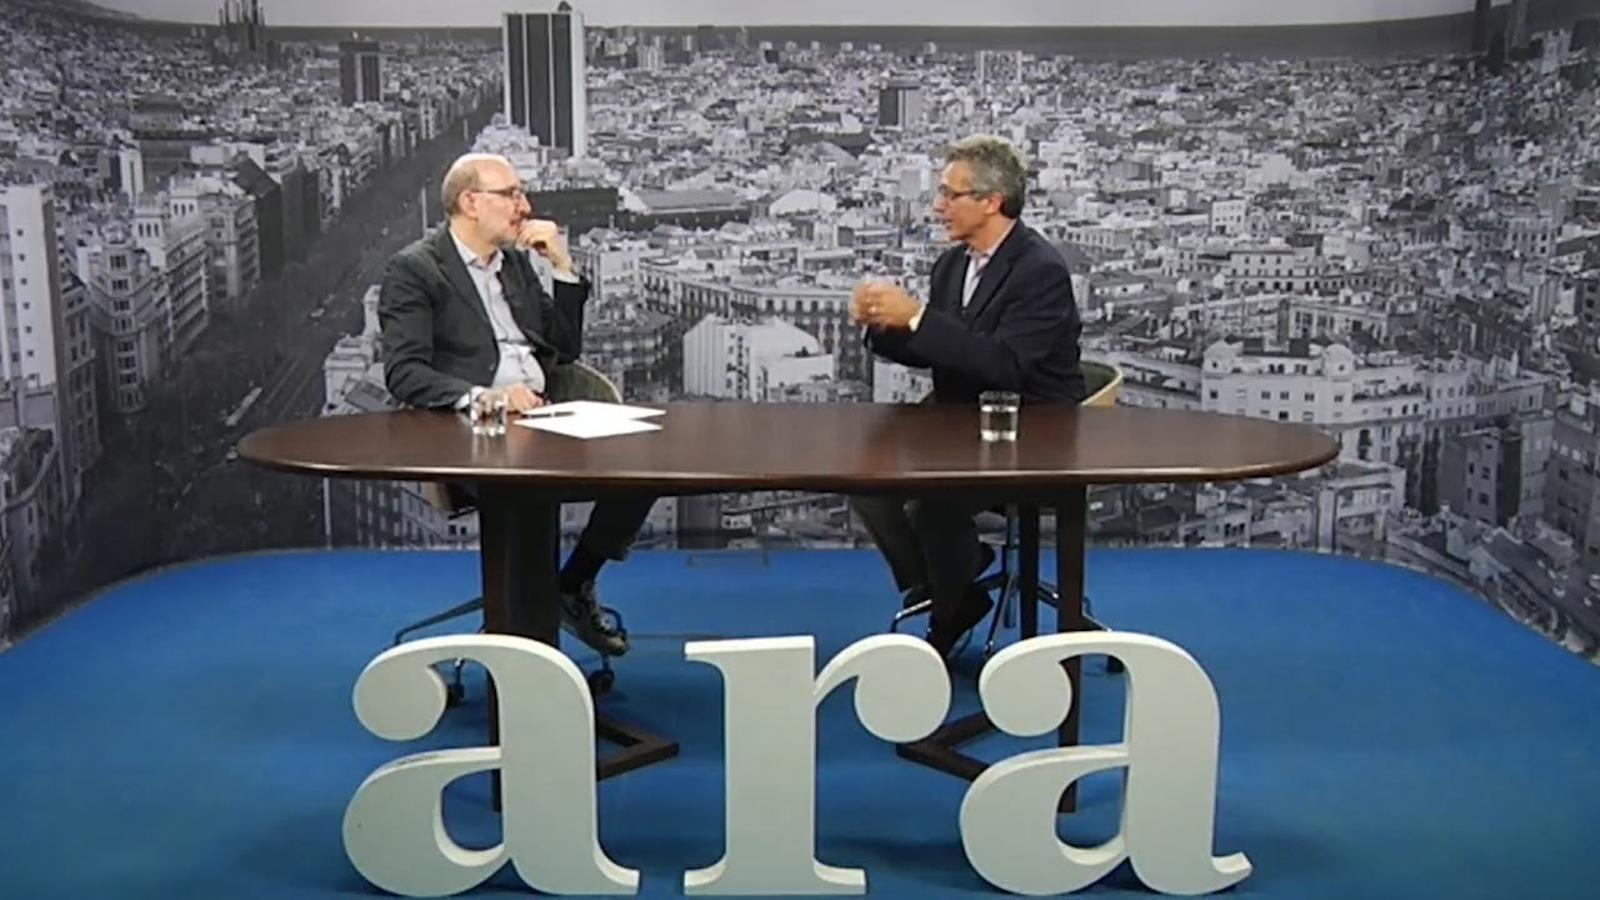 Entrevista d'Antoni Bassas a Álvaro Pascual-Leone